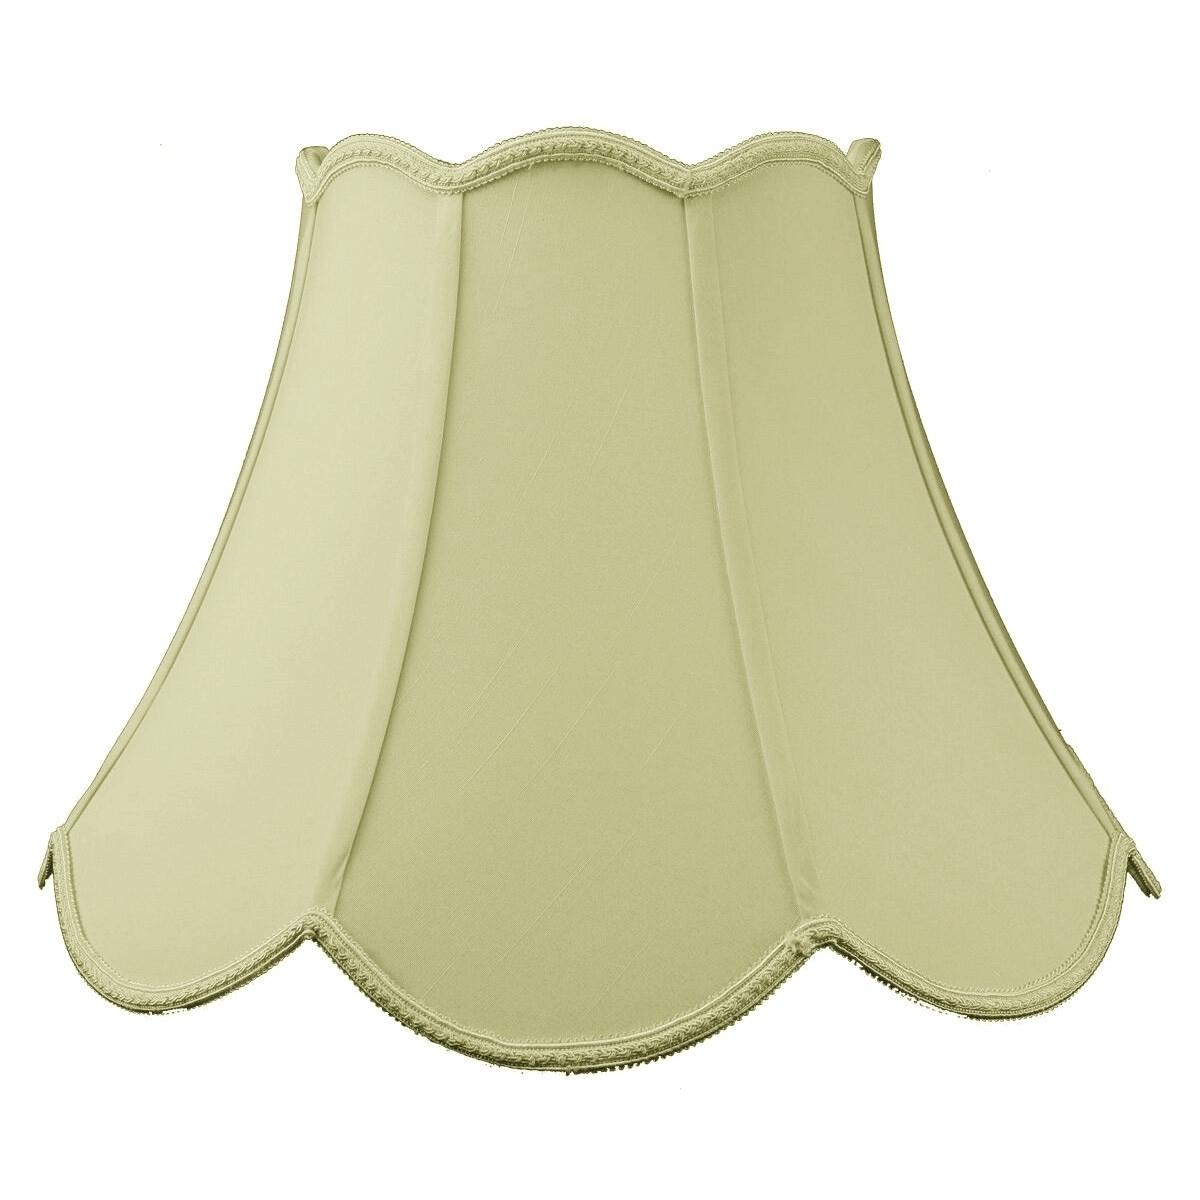 Concept 9x18x13 Scalloped Bell Lamp Shade Eggshell, Beige...